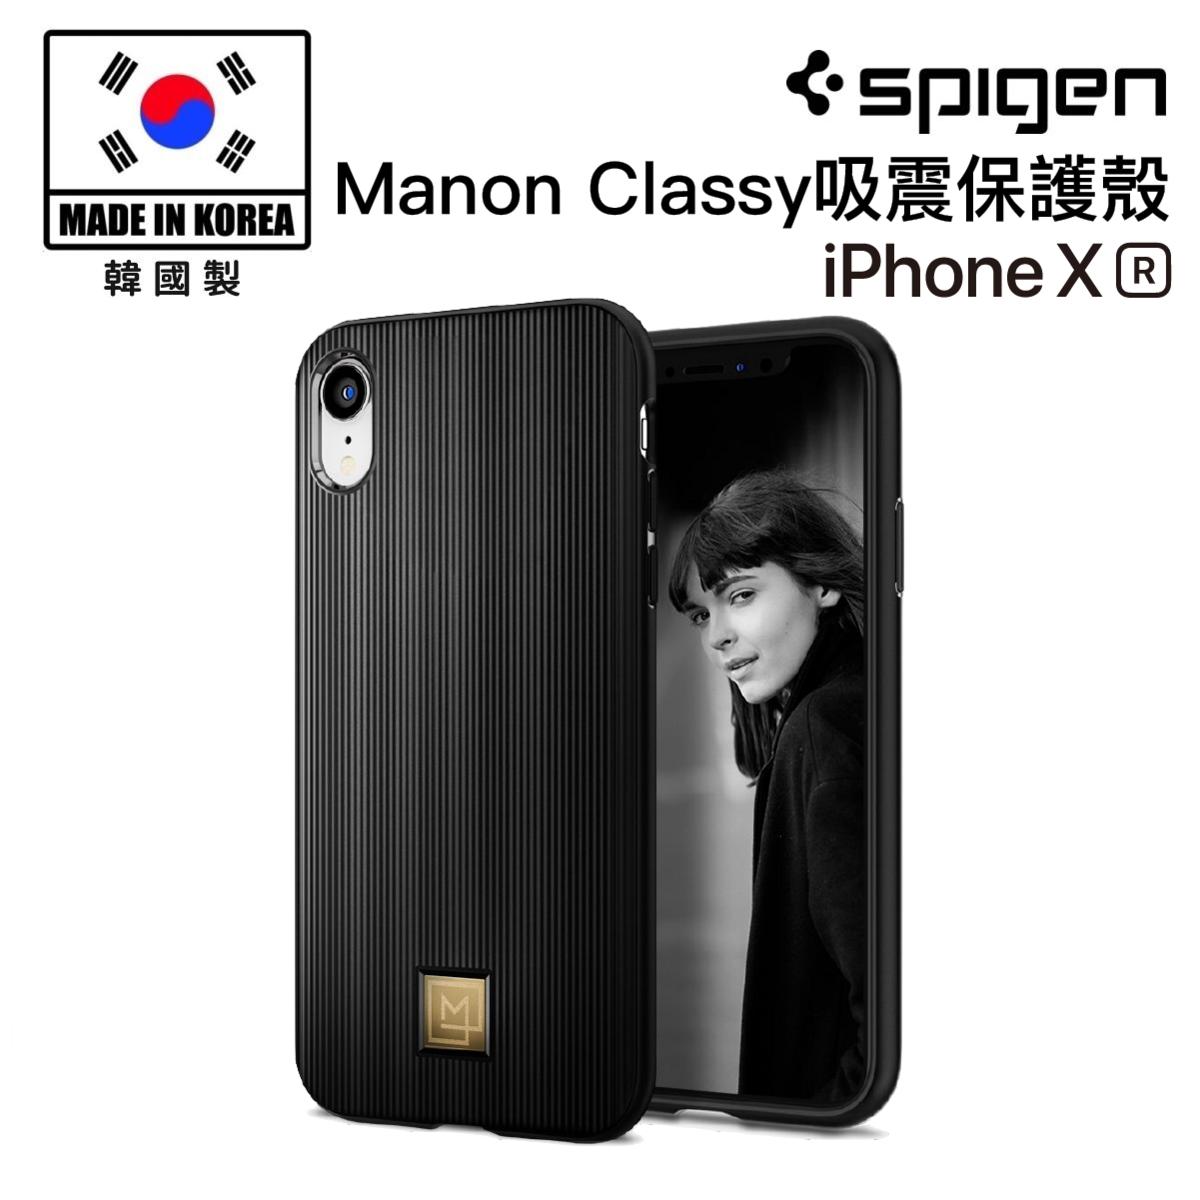 Spigen iPhone XR Case La Manon Classy - Black